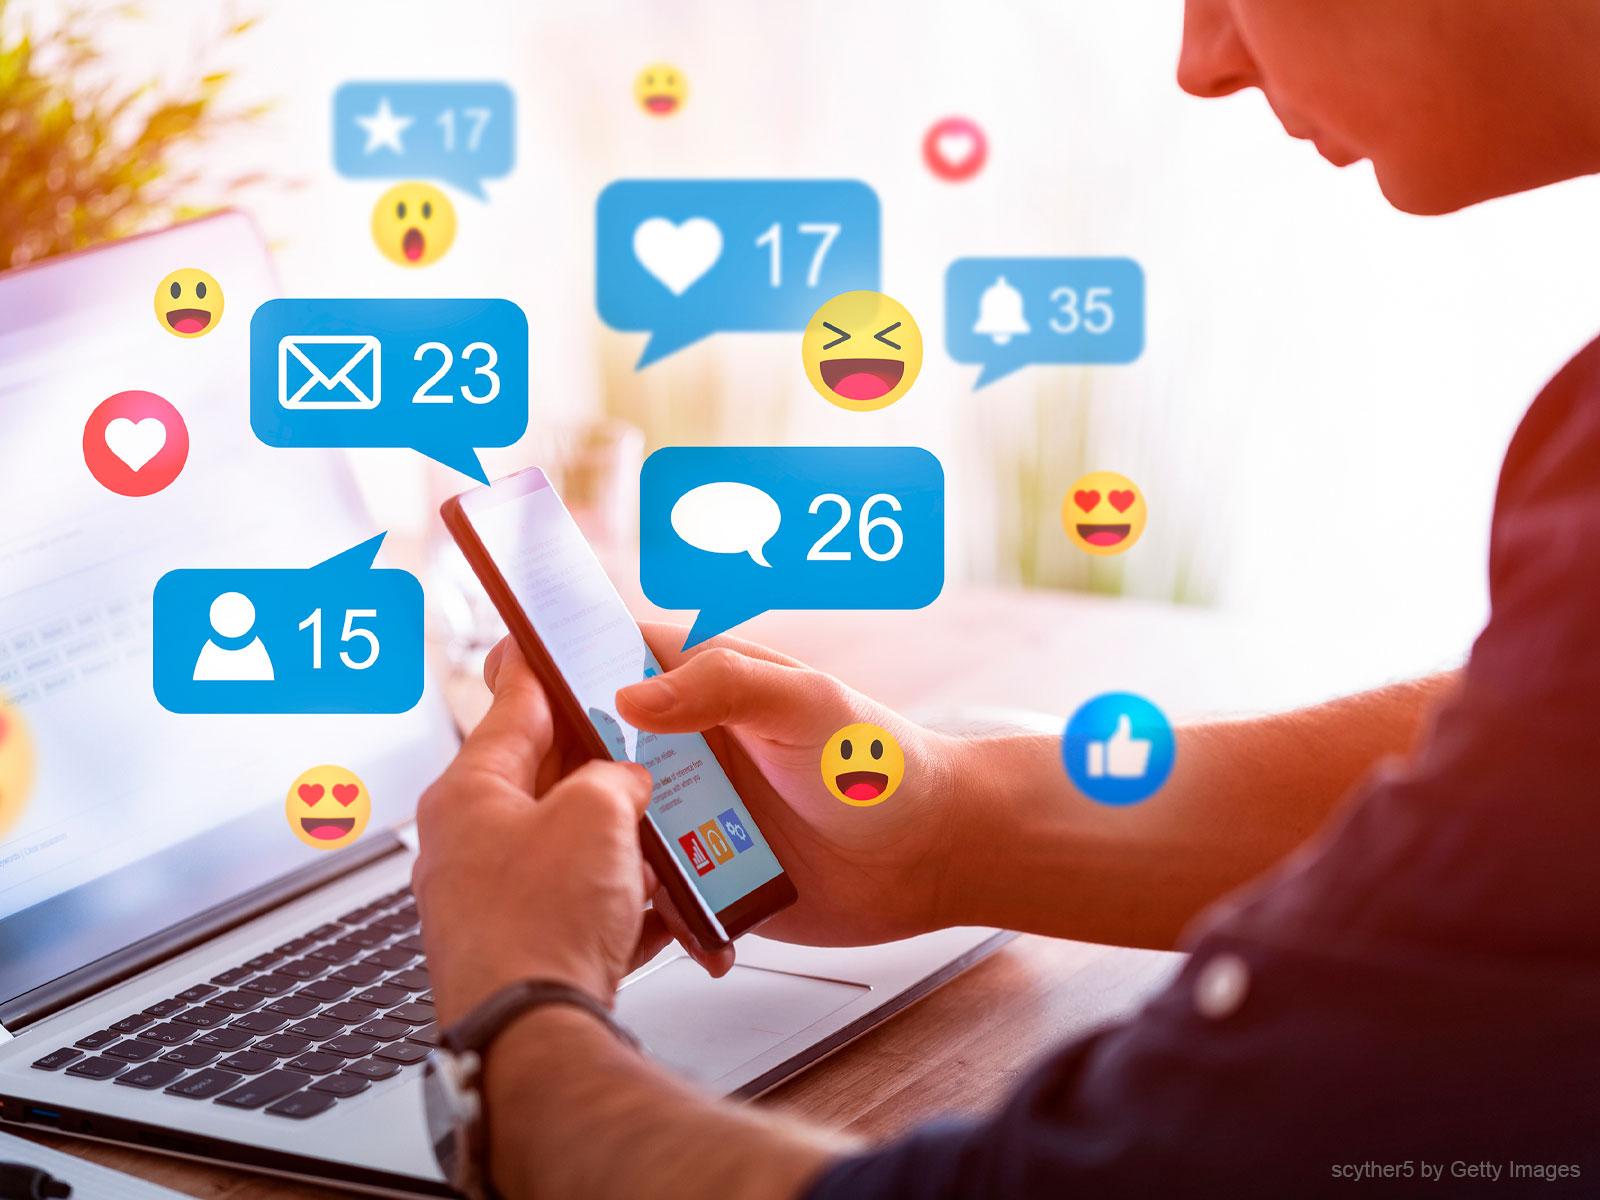 Que mal pode haver por trás das mídias sociais?